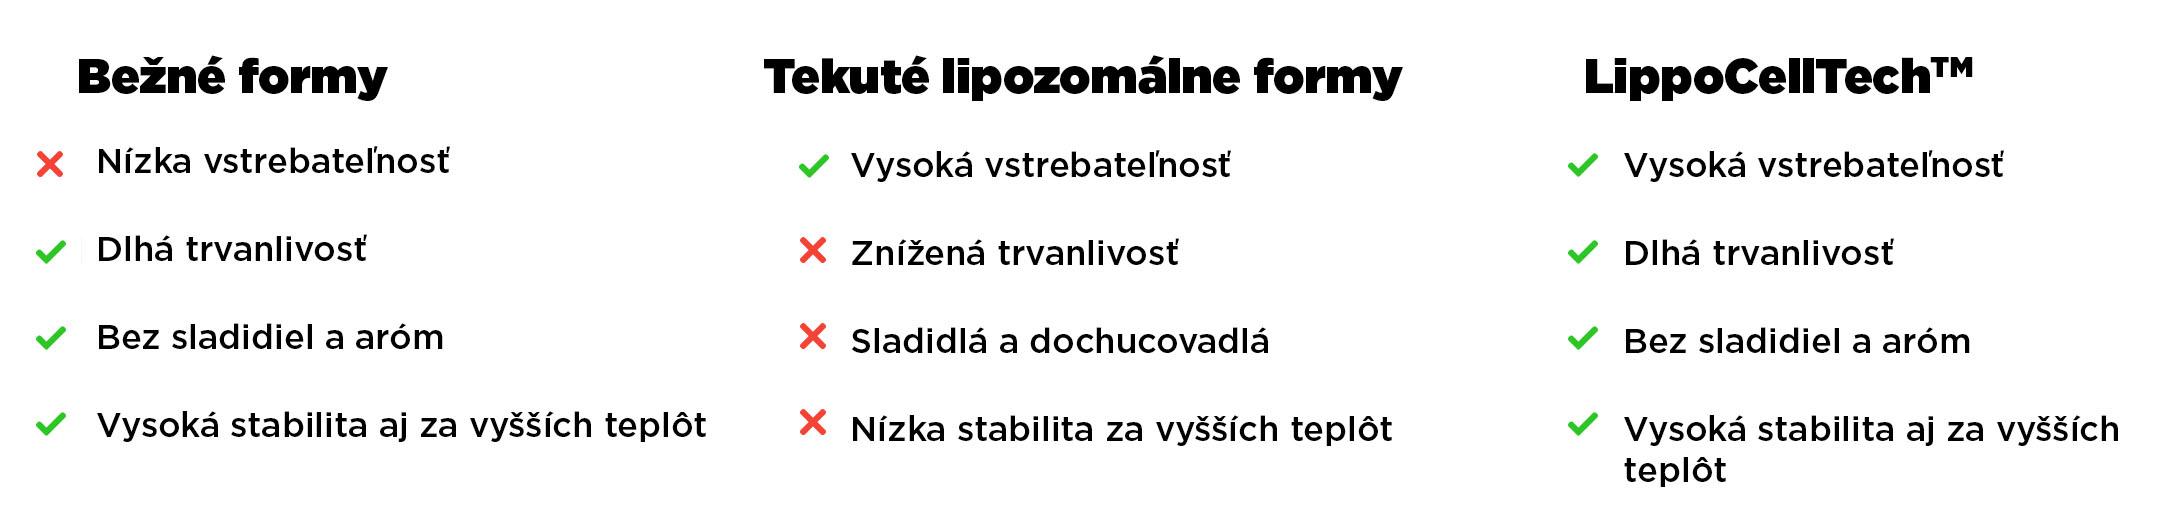 lipocelltech-infografika-brainmarket-sk